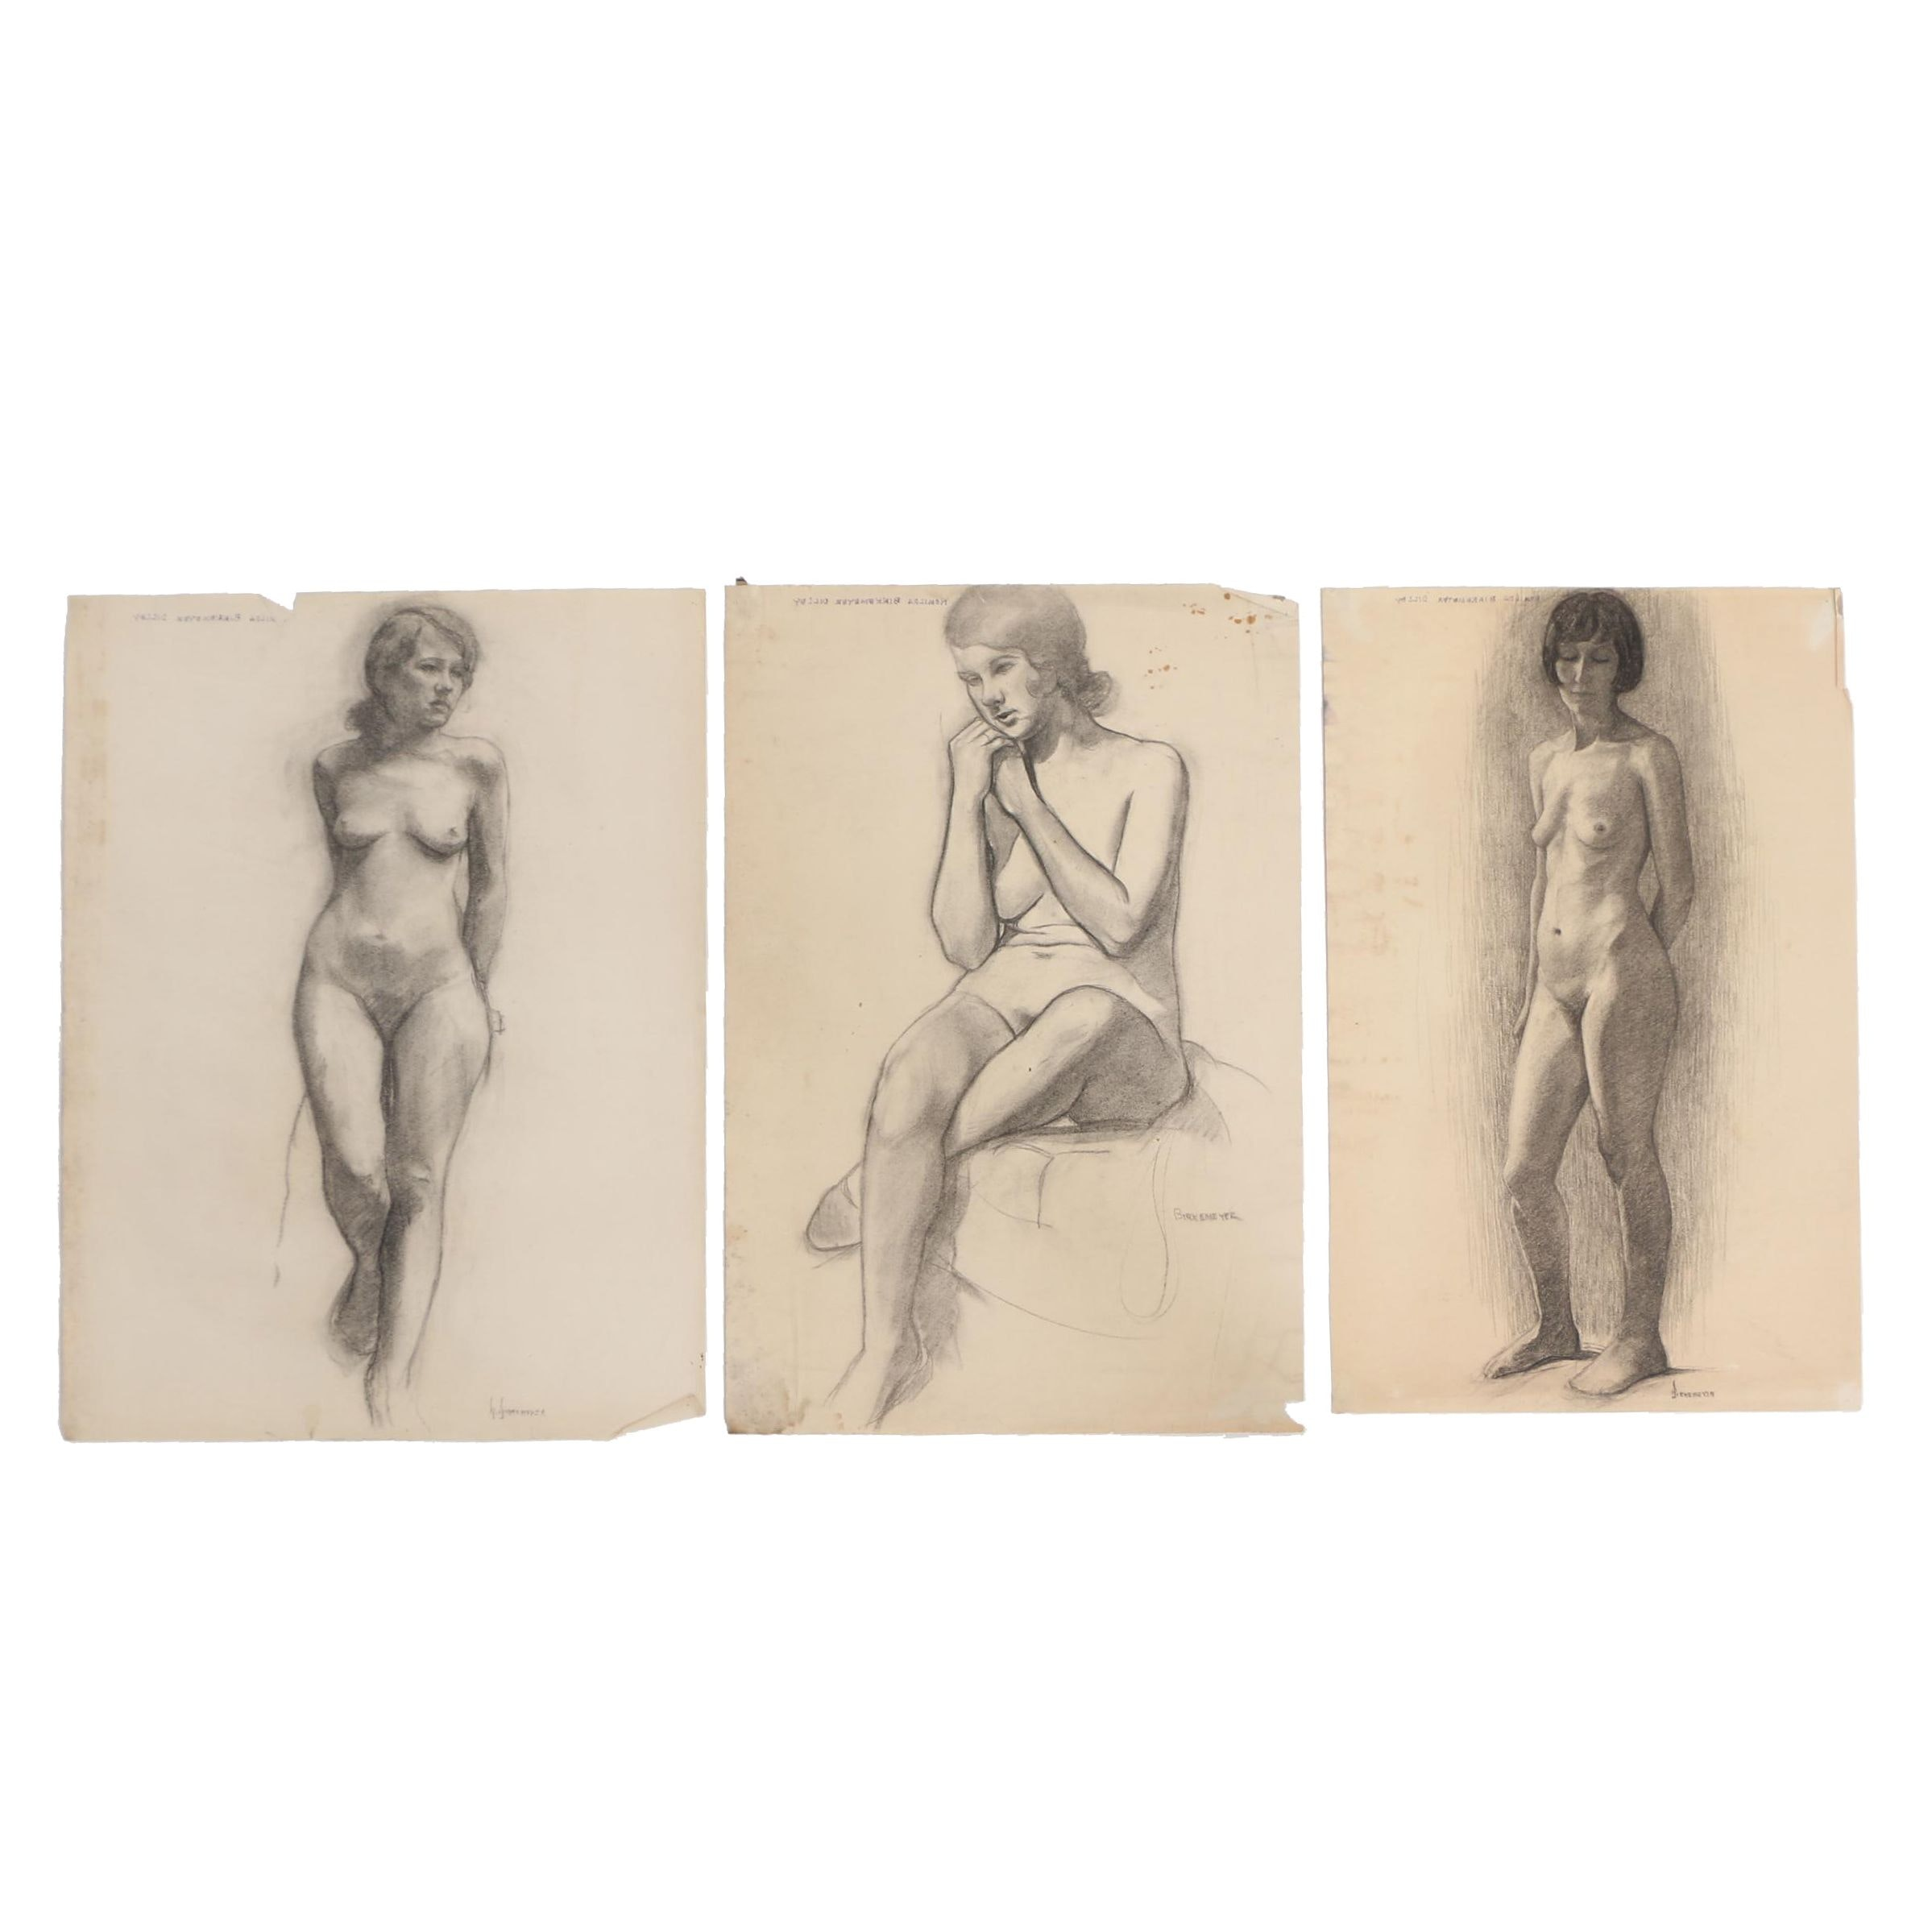 Romilda Birkemeyer Dilley Charcoal Drawings of Female Figural Studies